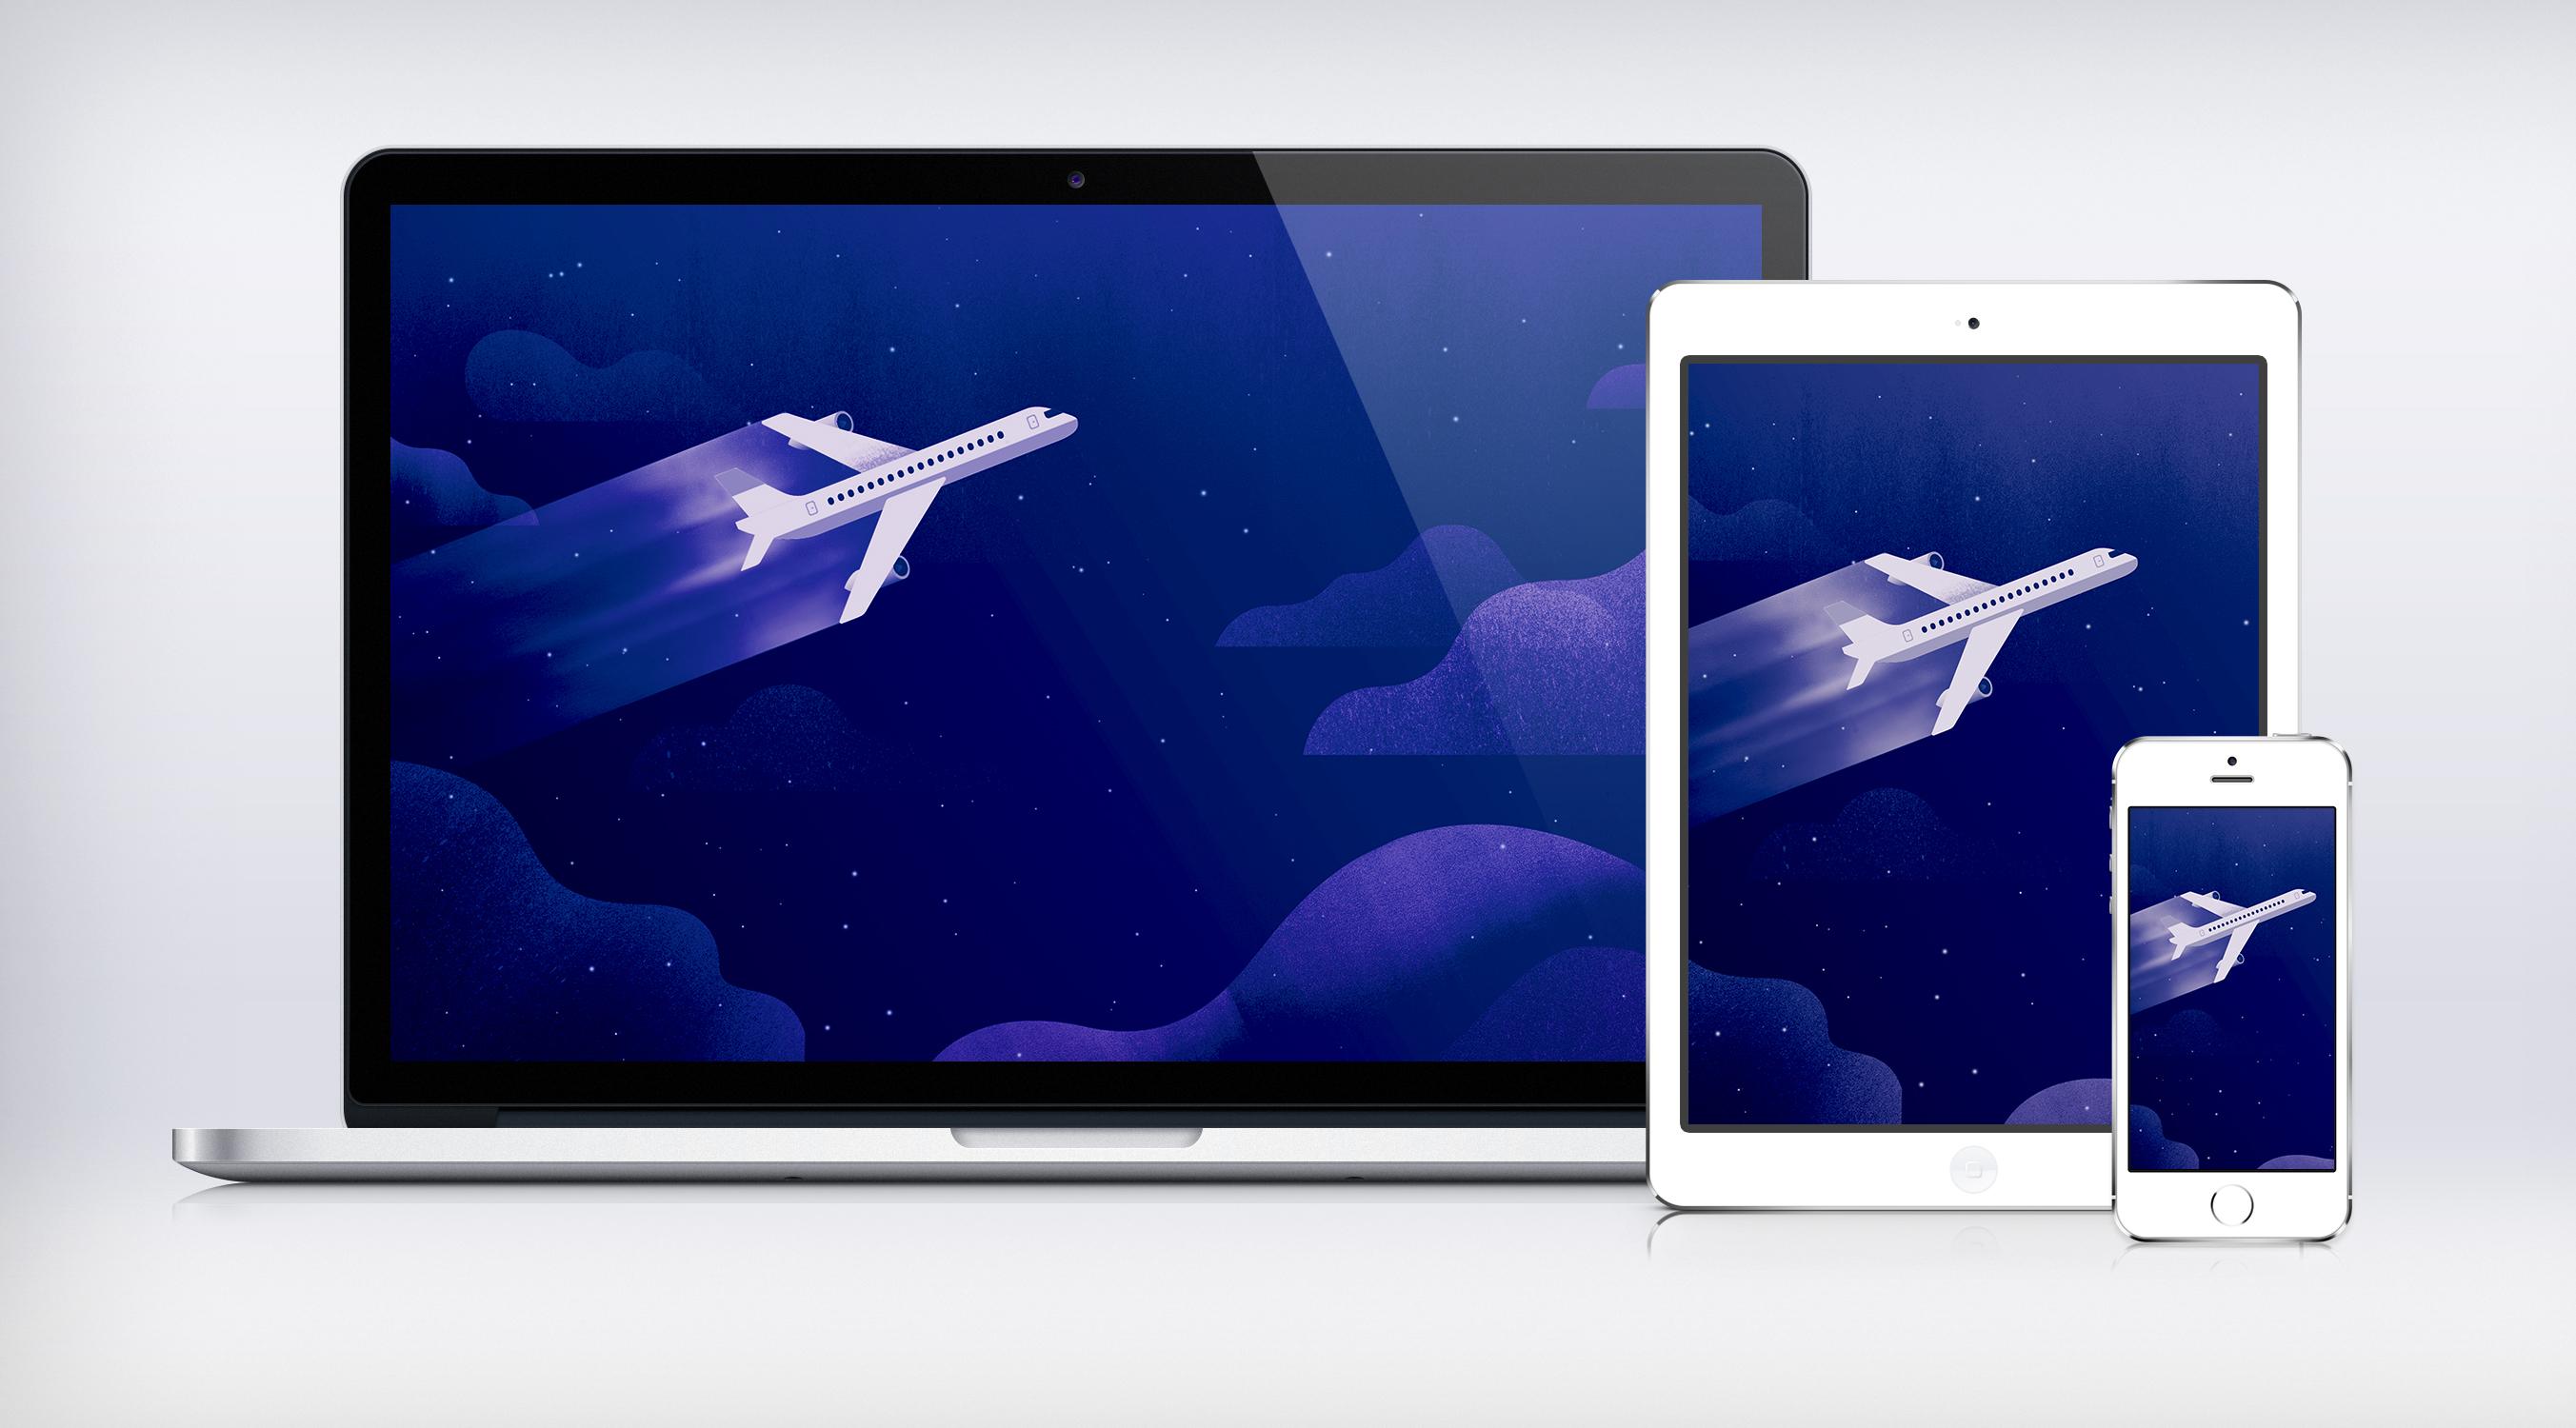 Google I/O Night Plane Wallpaper Material Design